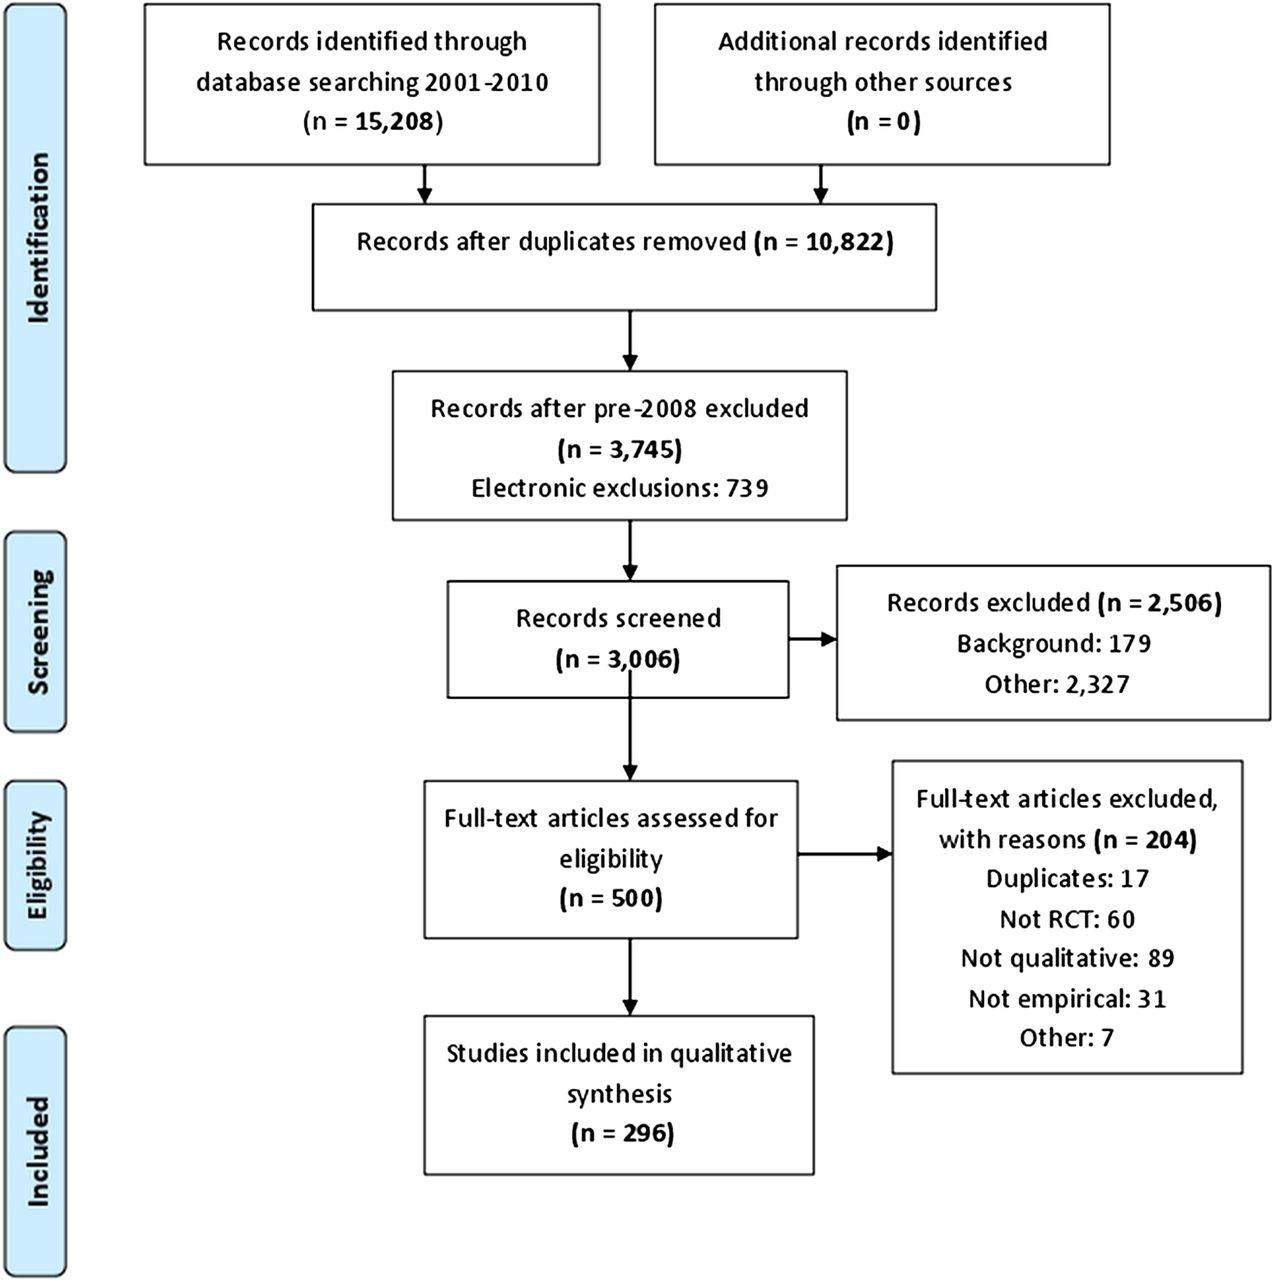 Types of Research  authorSTREAM